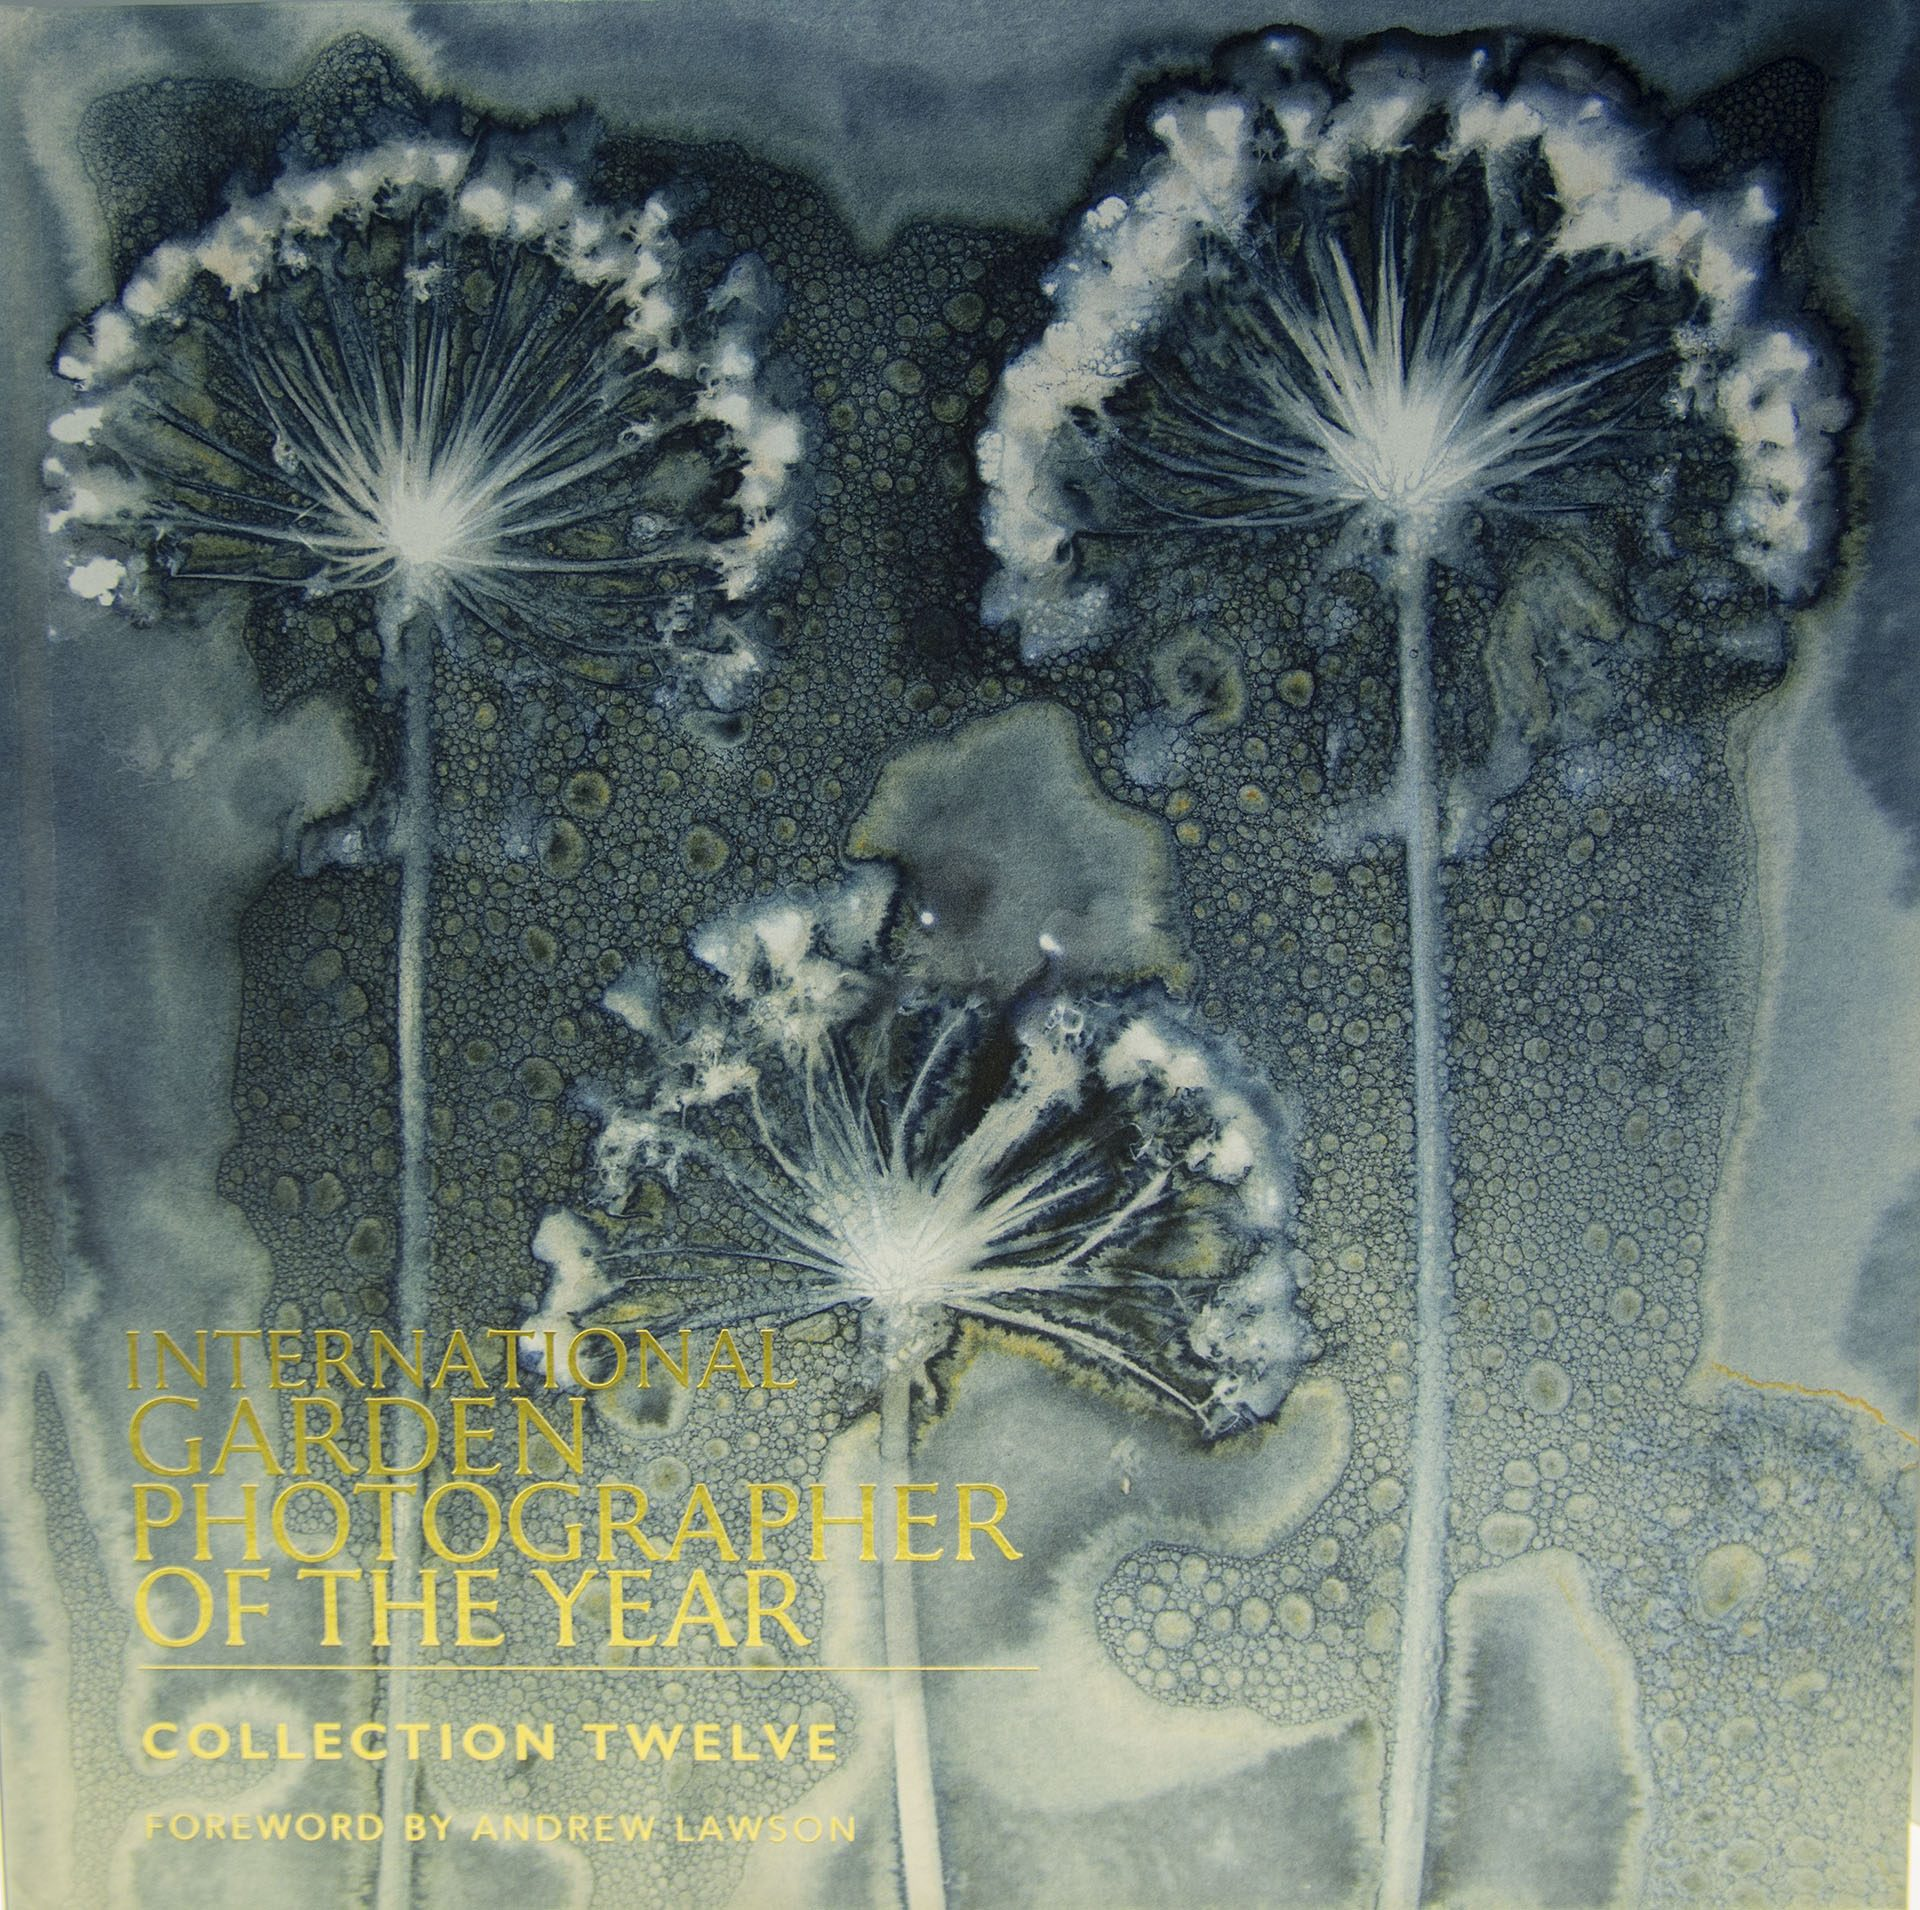 International Garden Photographer of the Year - Book 12